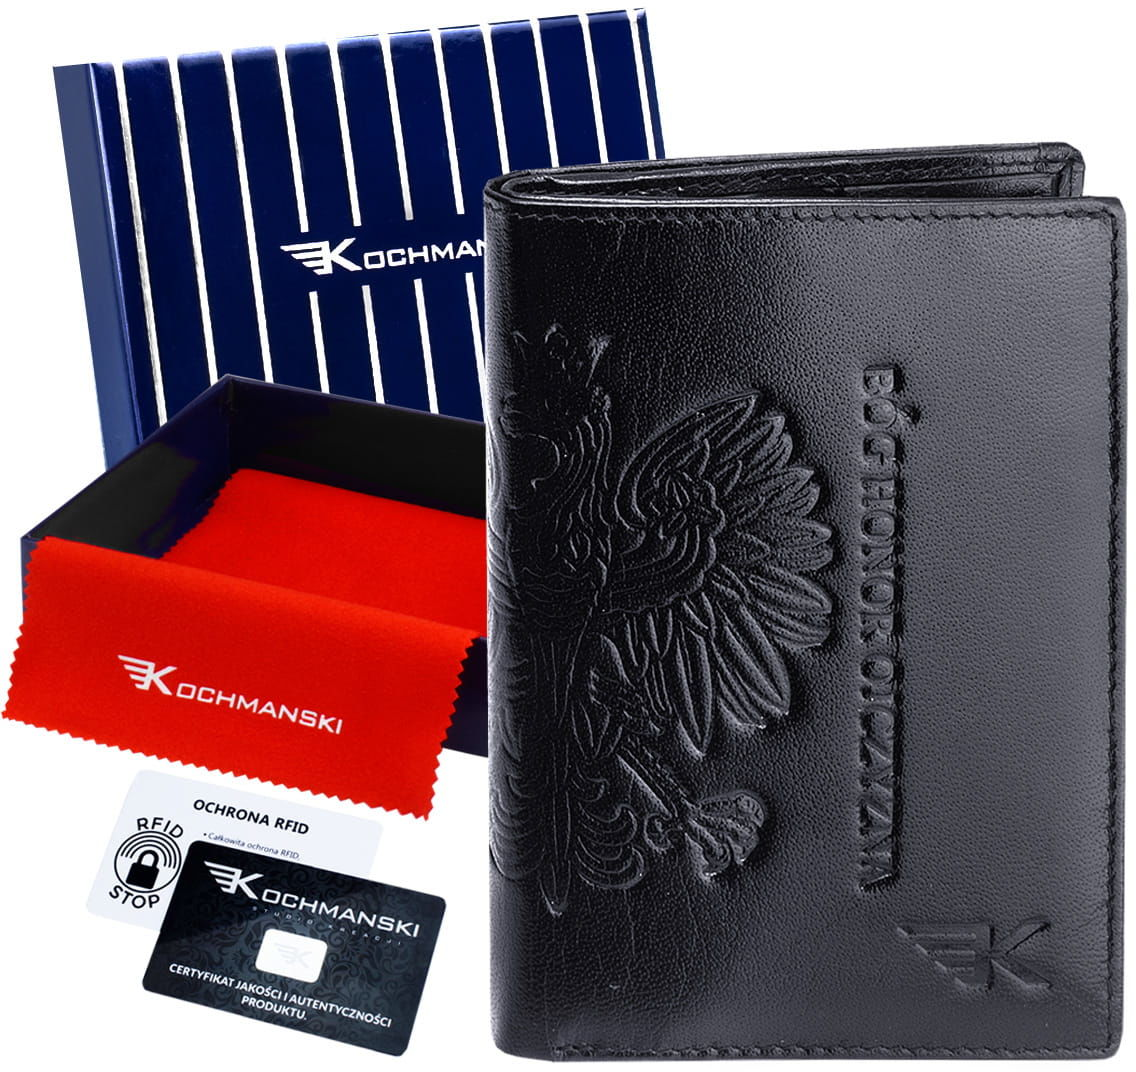 KOCHMANSKI skórzany portfel męski PREMIUM cienki 3043